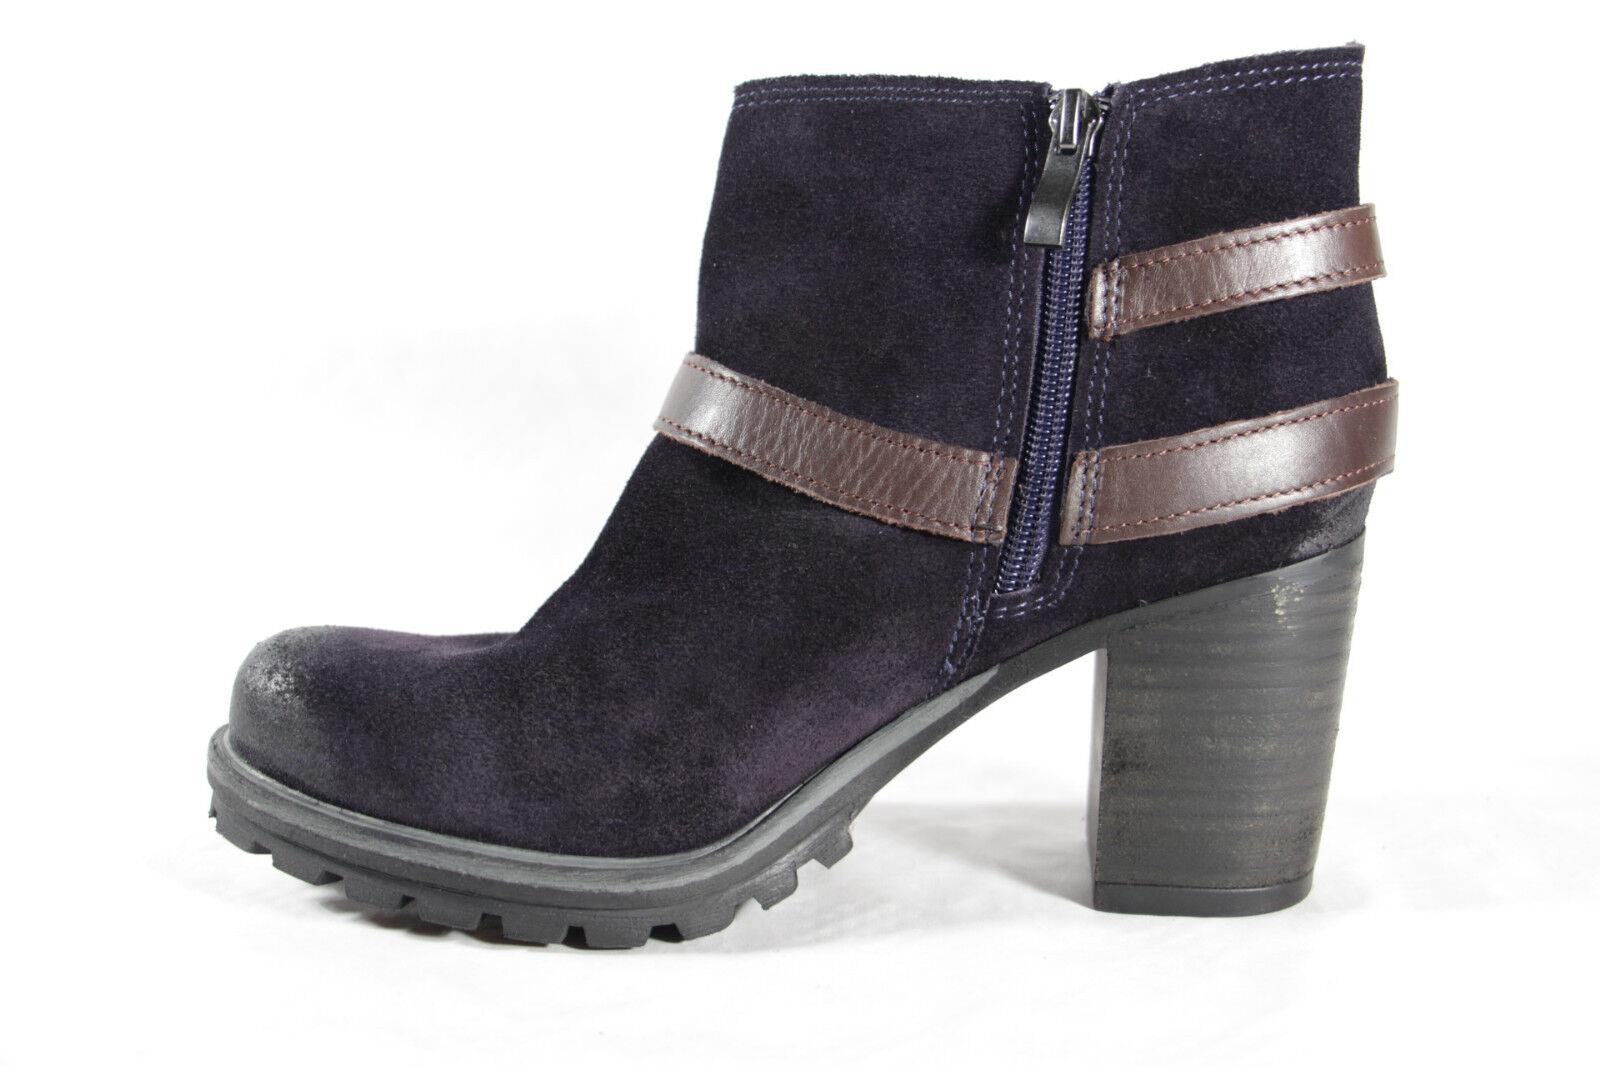 Marco Tozzi Leder Stiefelette Stiefel, blau, Leder Tozzi 25409  NEU f7ab55